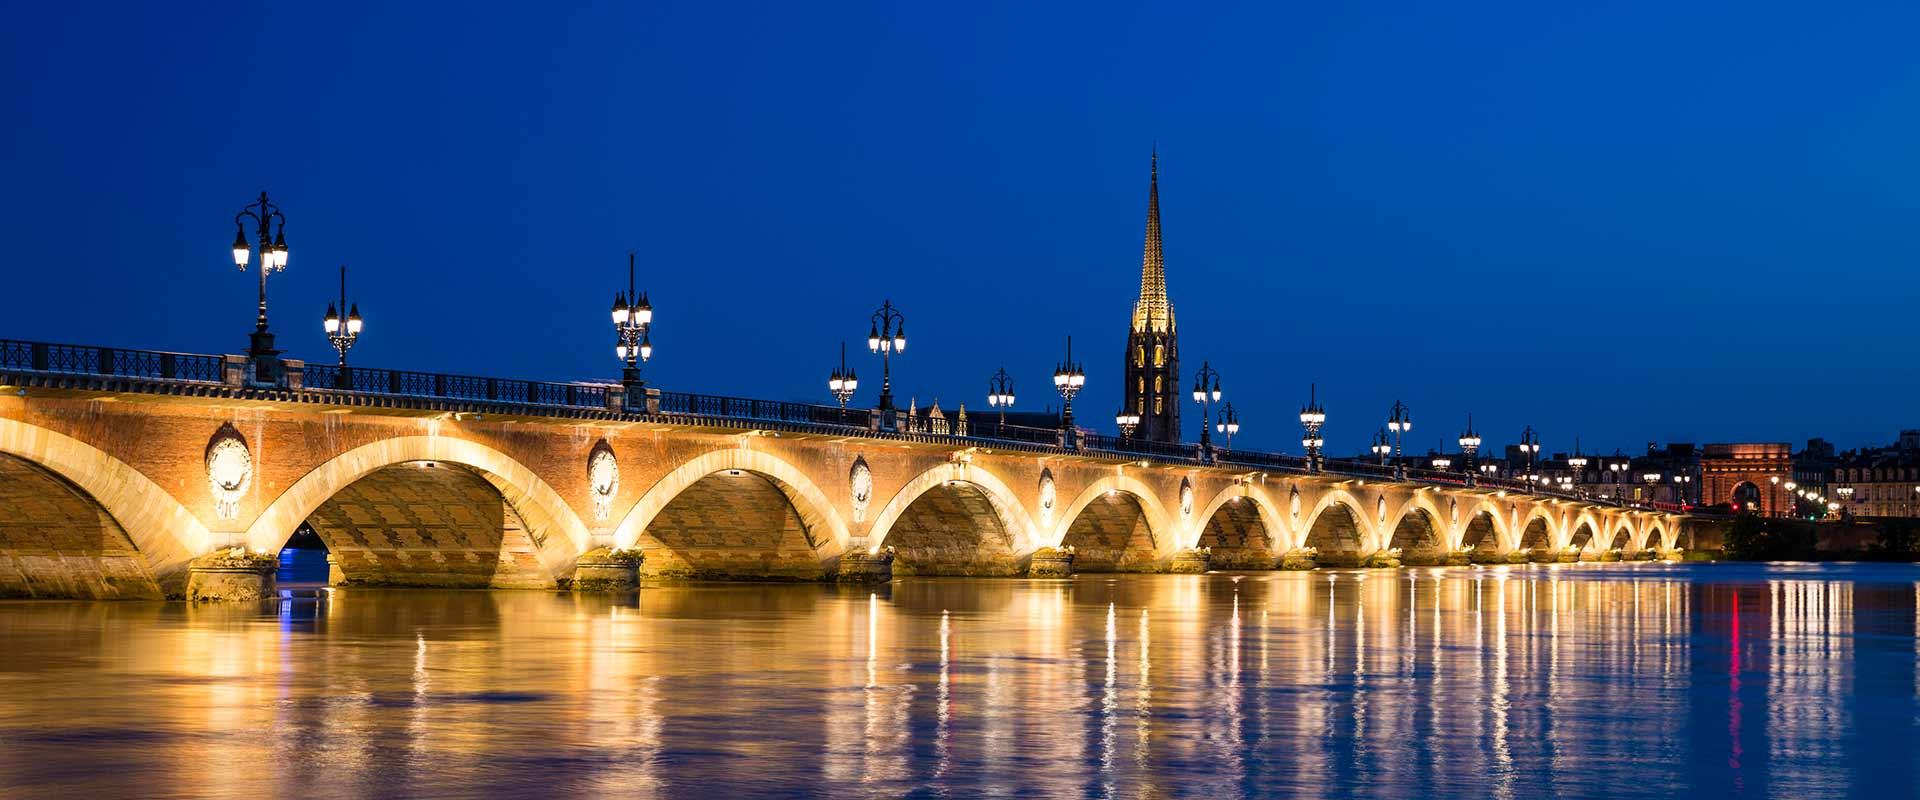 Scenic - Beautiful Bordeaux